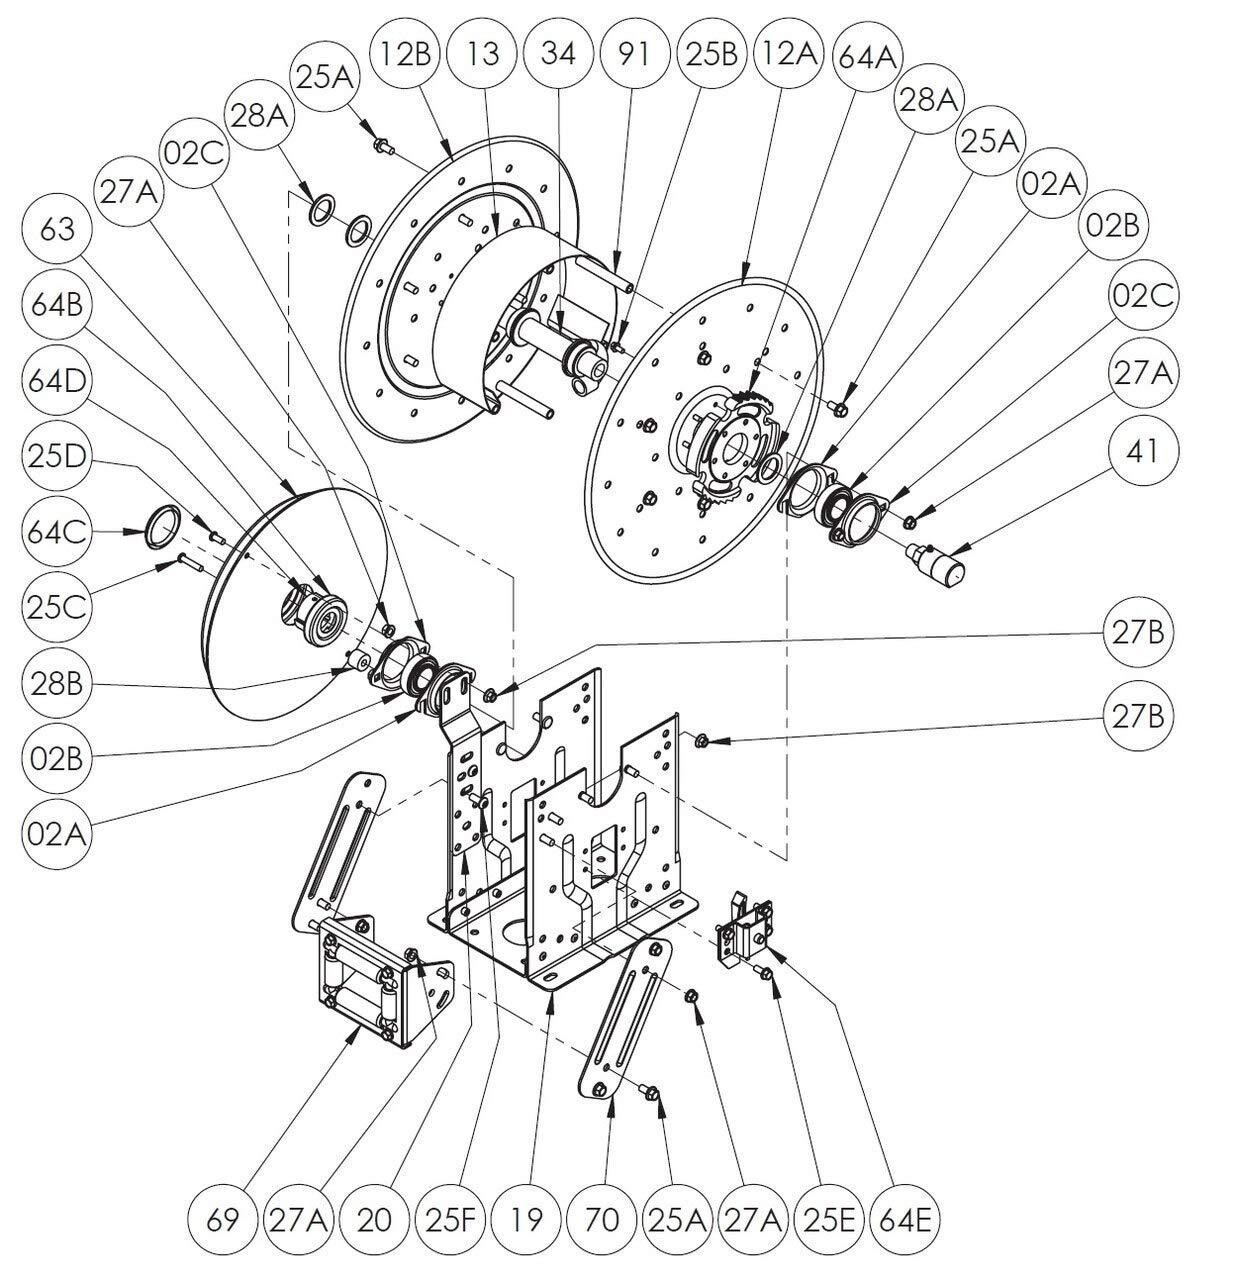 All 64E DEF Series Spring Rewind Reel Parts Ratchet Lock